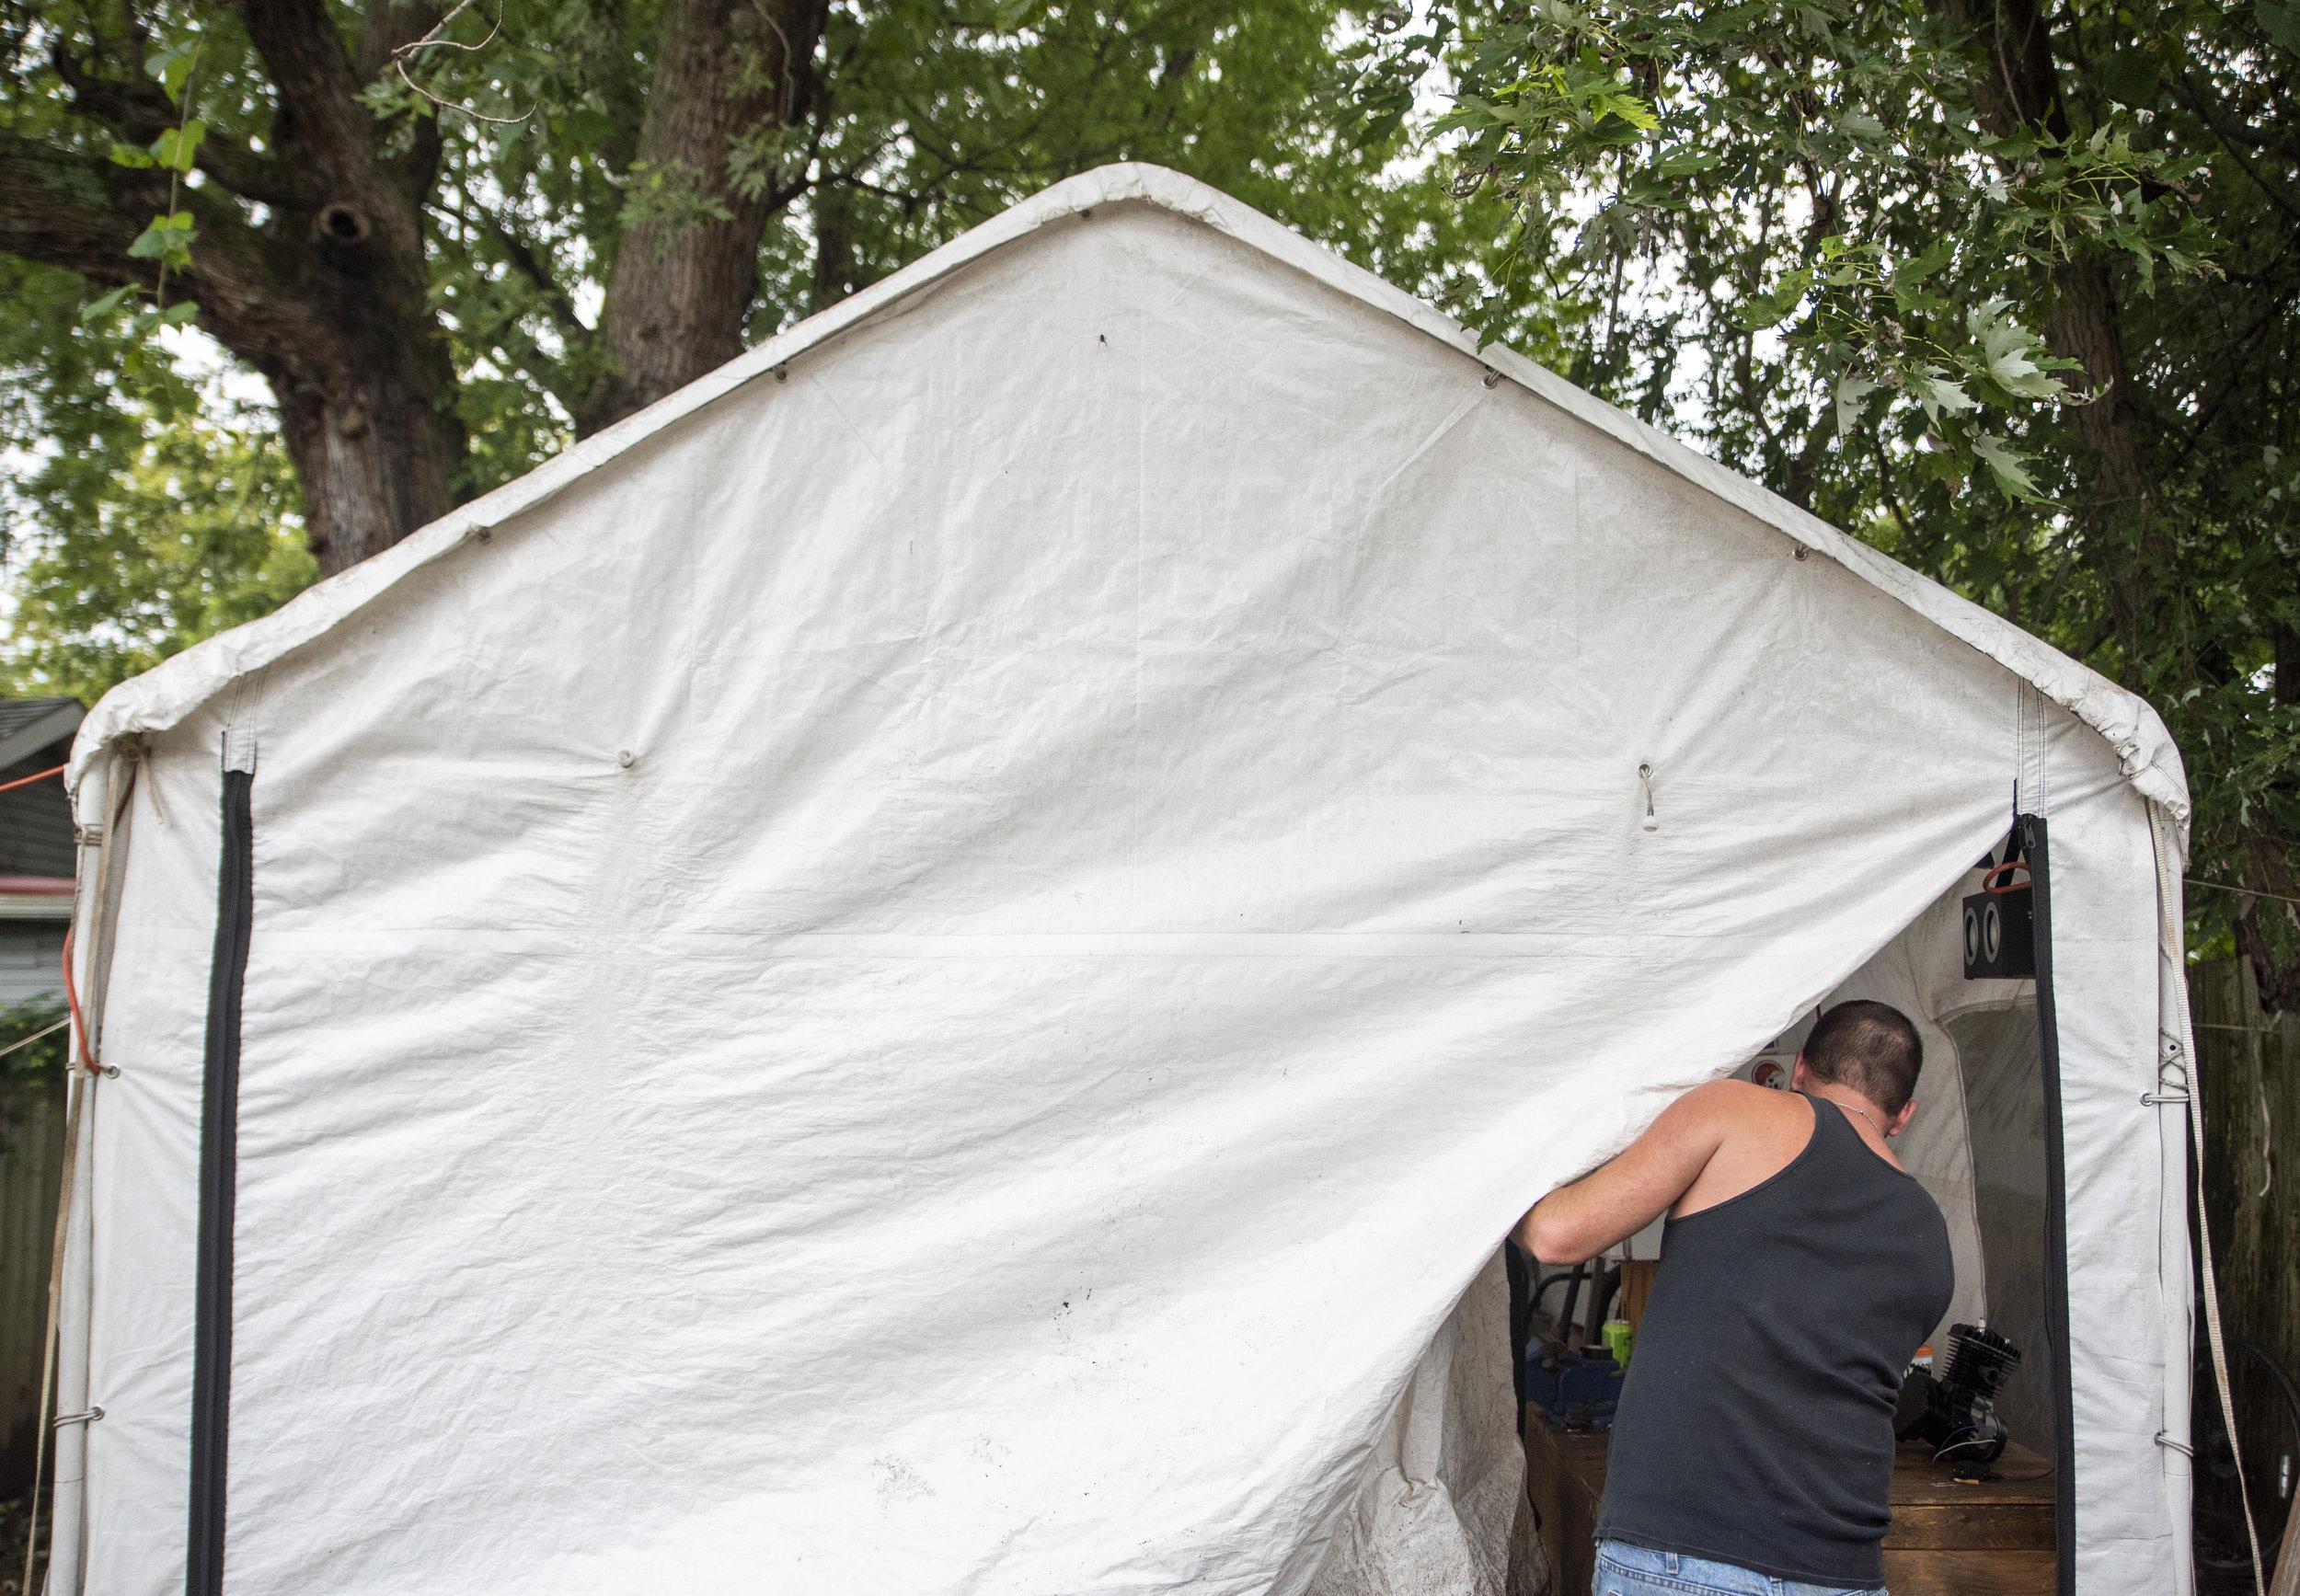 Calvin unzips the tarp to his garage of motorized vehicles.